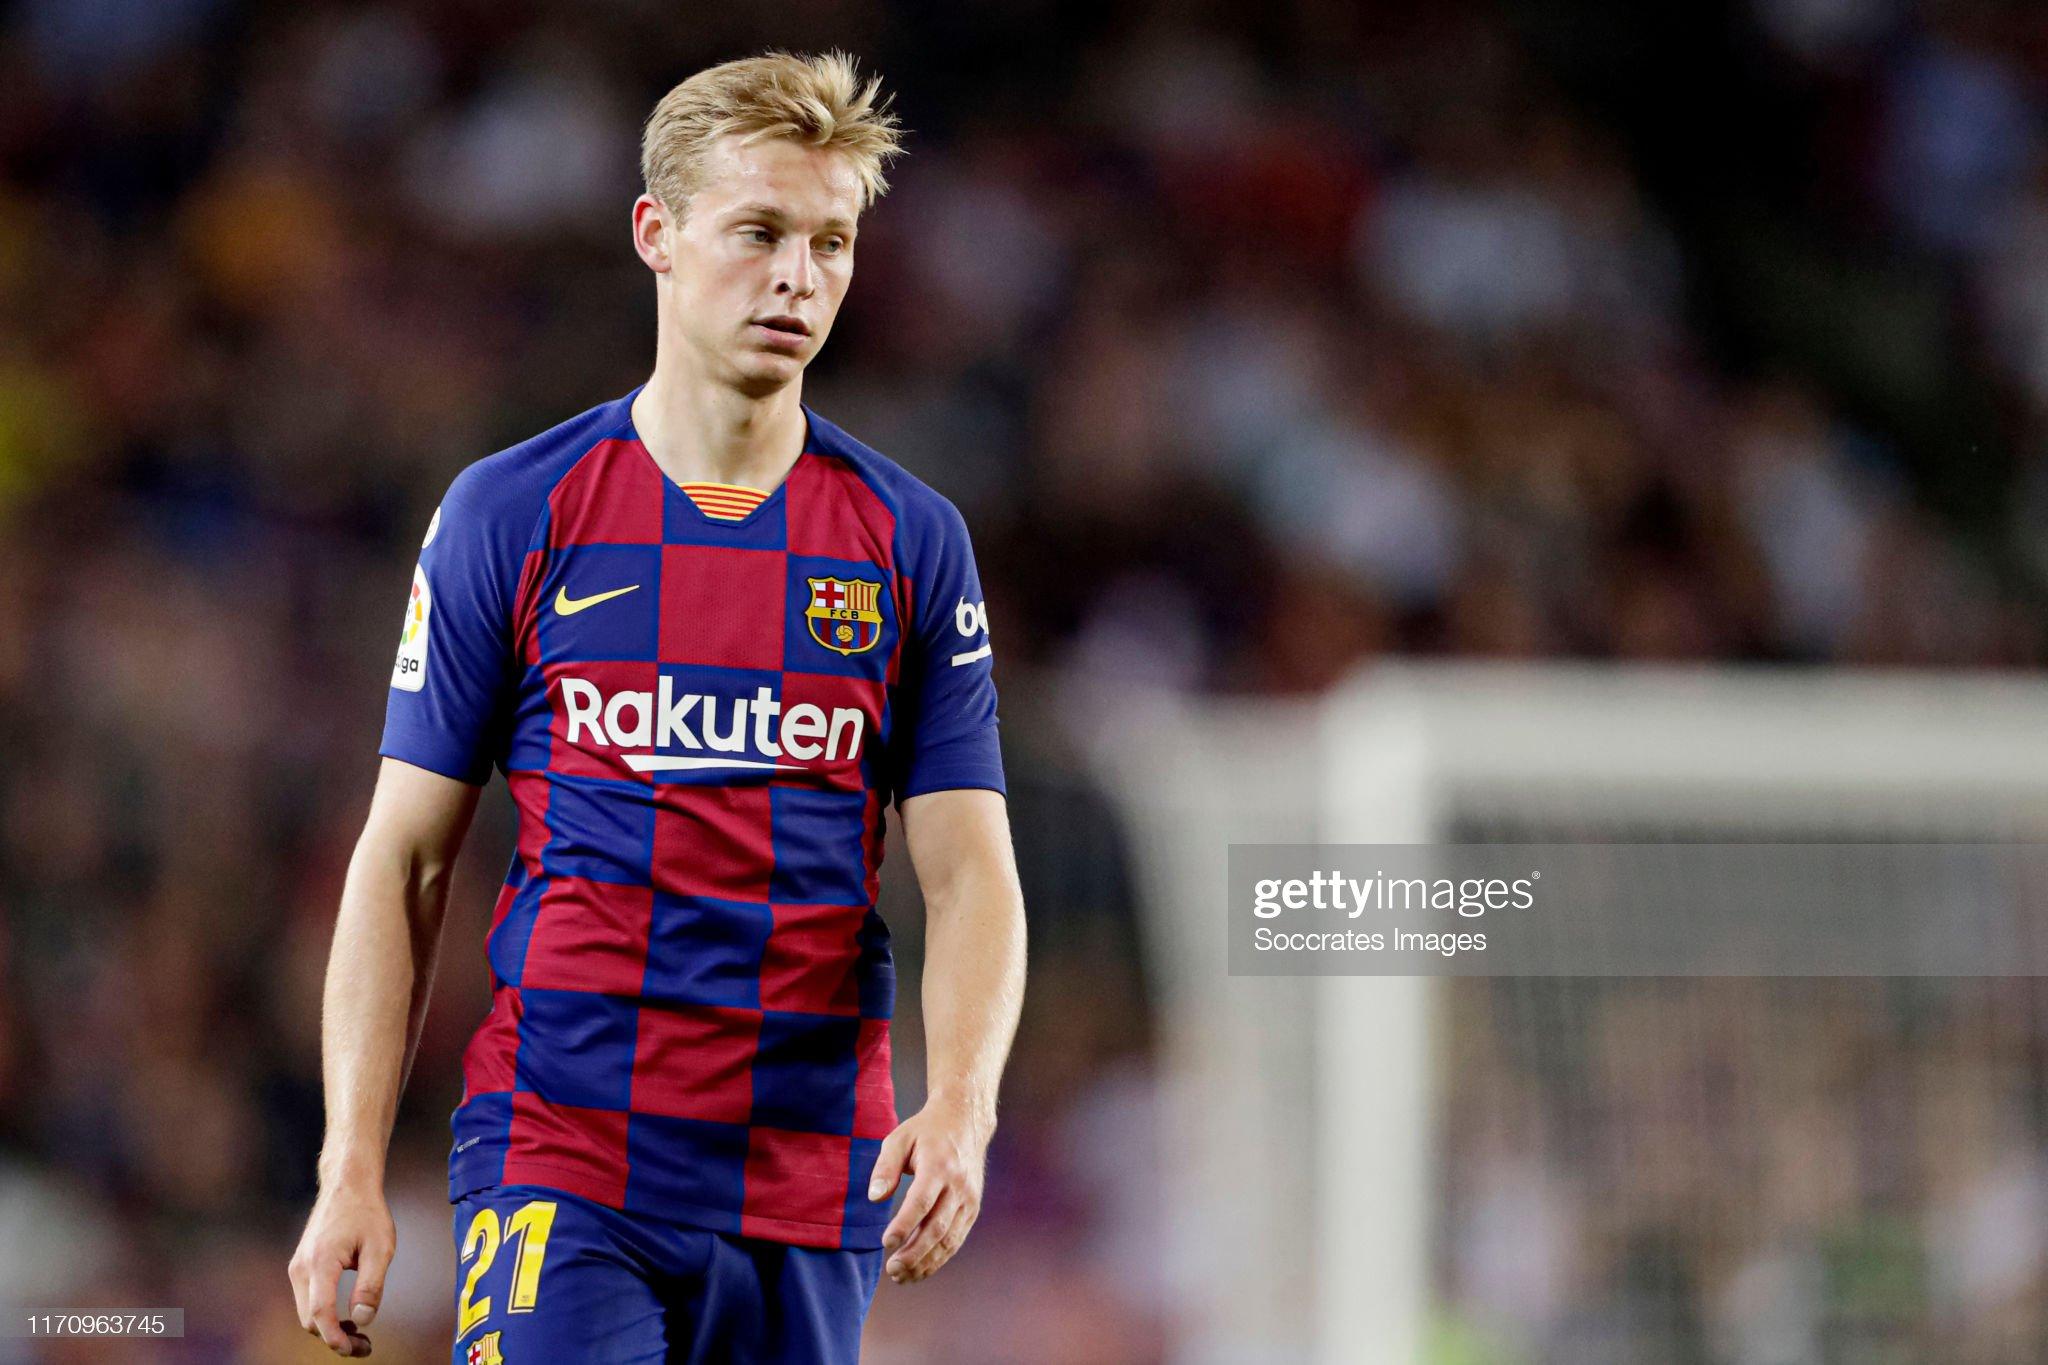 صور مباراة : برشلونة - فياريال 2-1 ( 24-09-2019 )  Frenkie-de-jong-of-fc-barcelona-during-the-la-liga-santander-match-picture-id1170963745?s=2048x2048